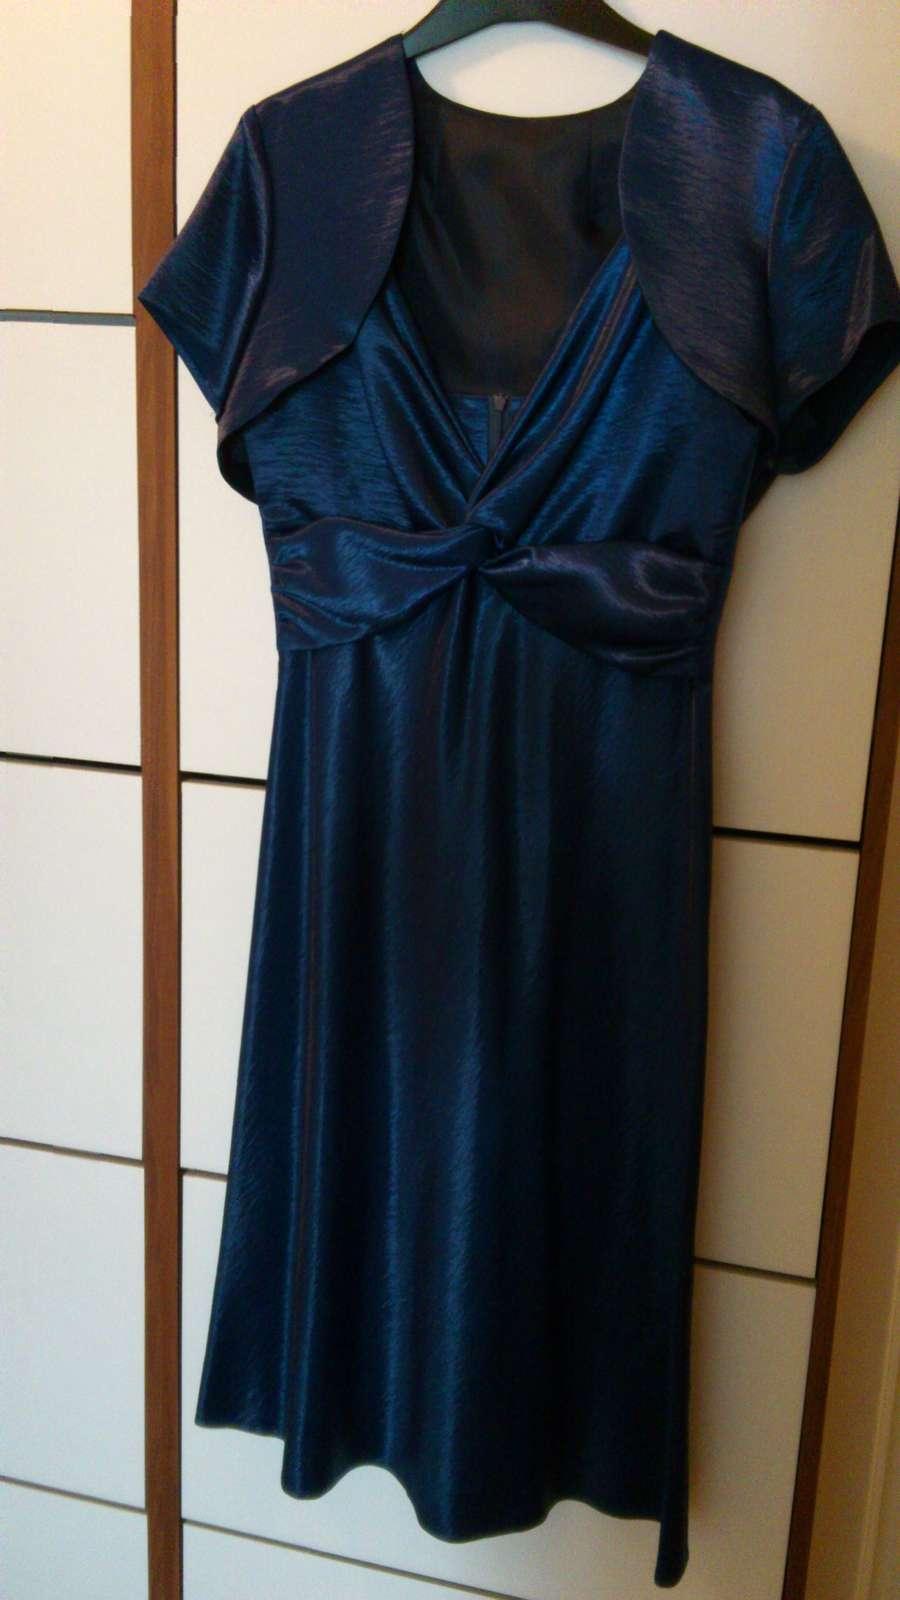 74bf031d34d Modre plesove saty z bolerkem